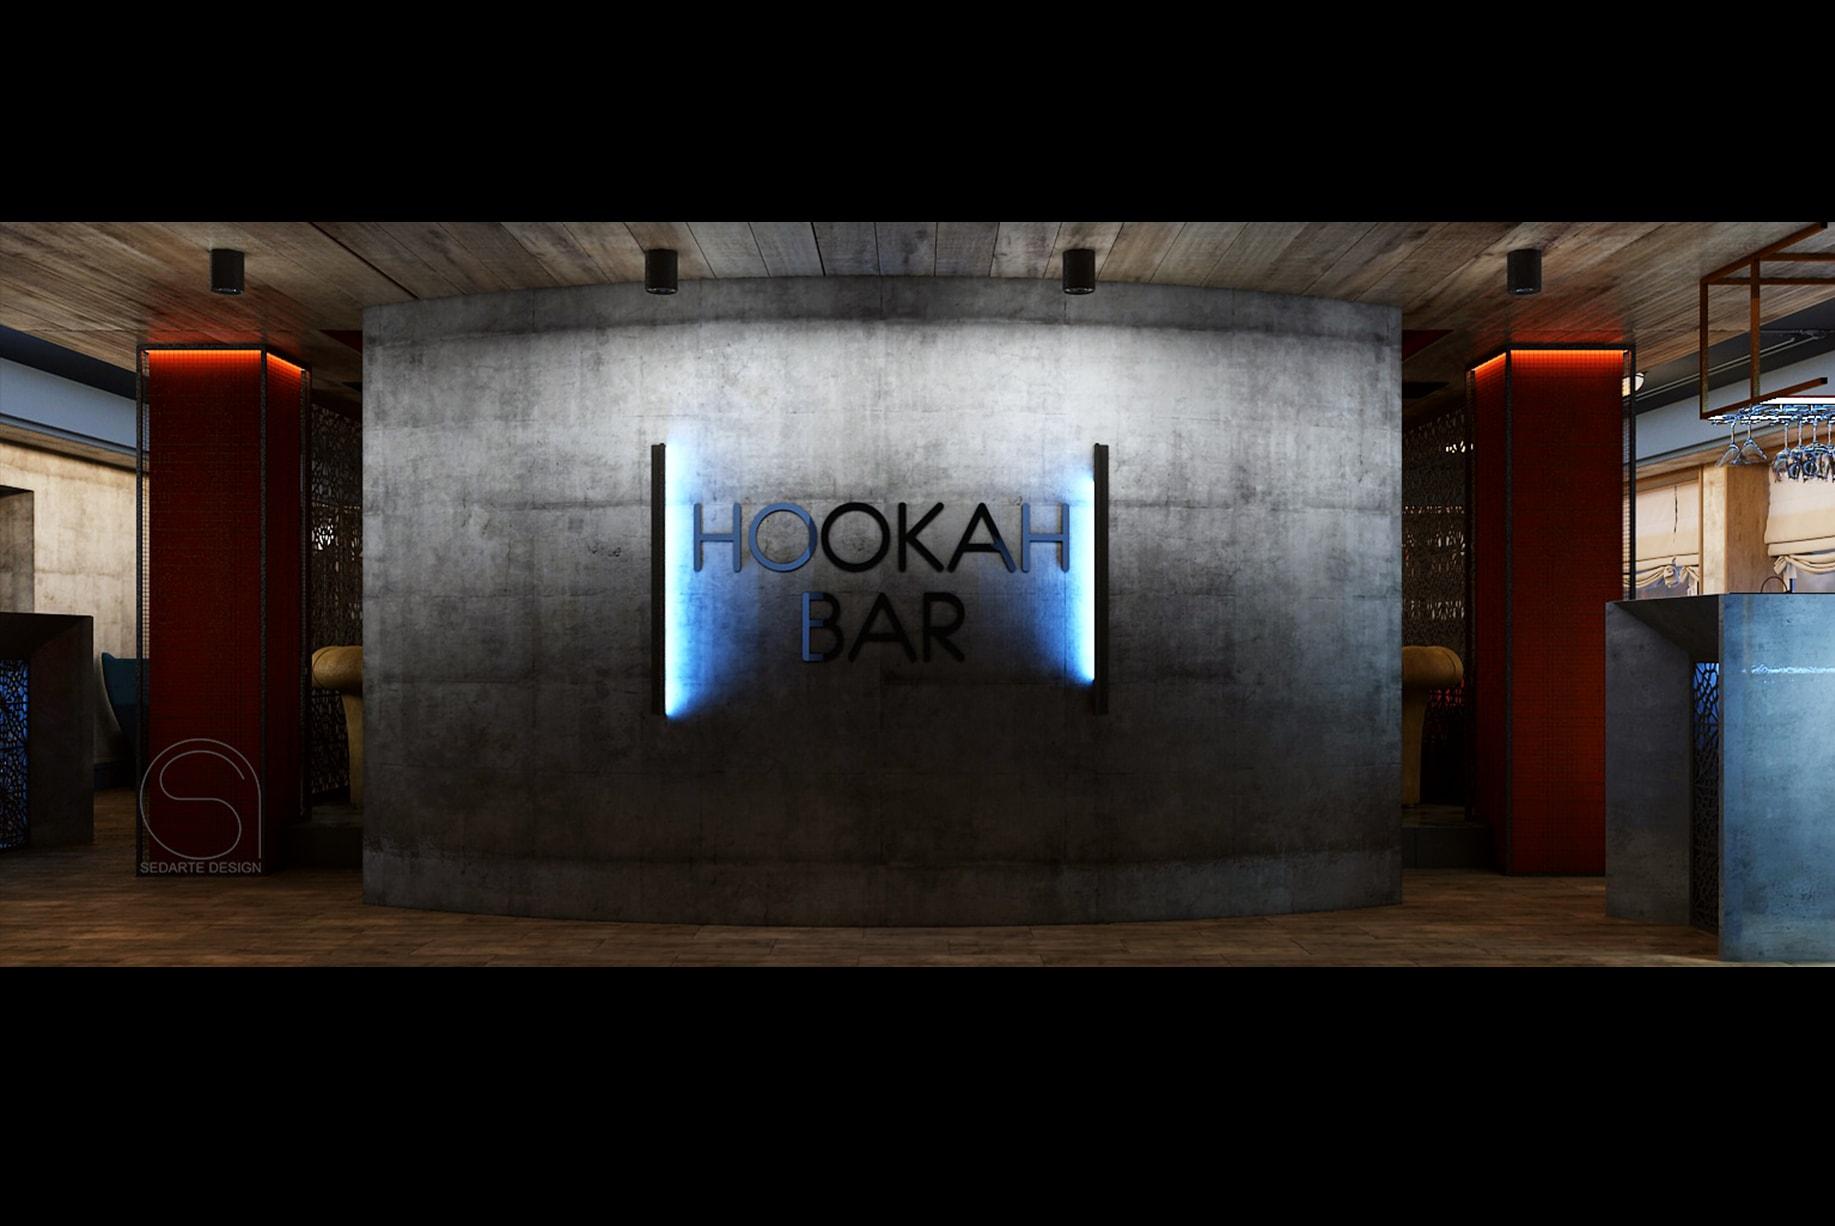 Hookah bar, м.Кременчук